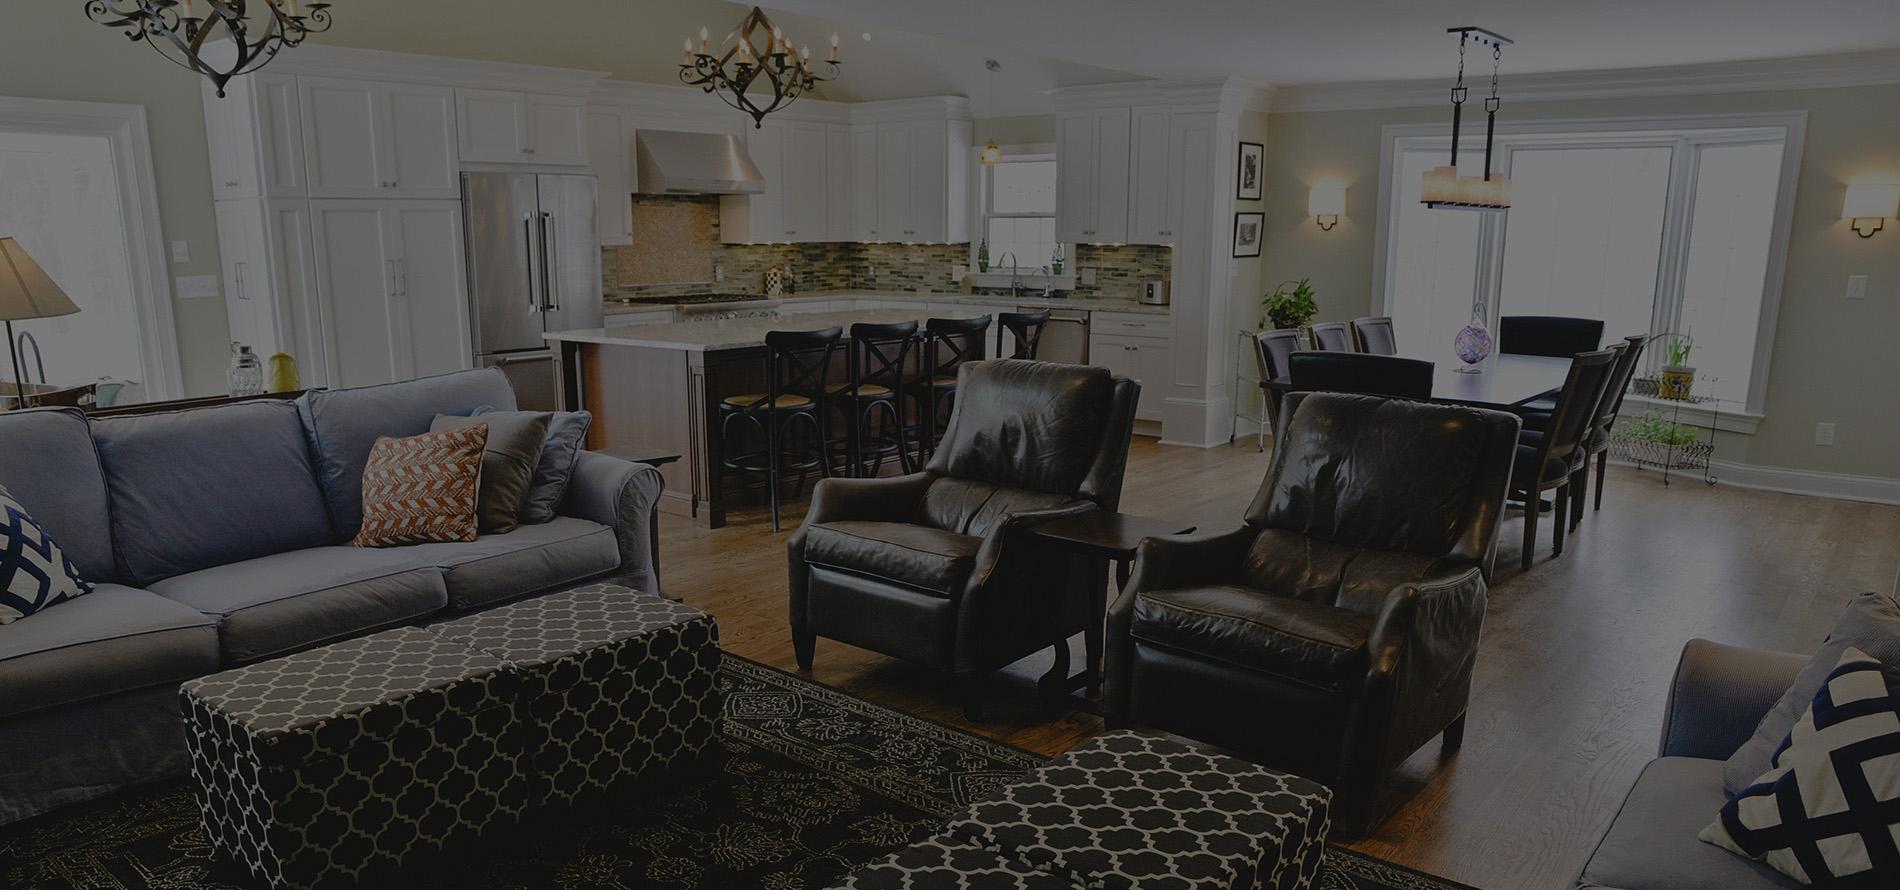 Home Remodel Cuyahogafalls Livingroomrenovation Hmp